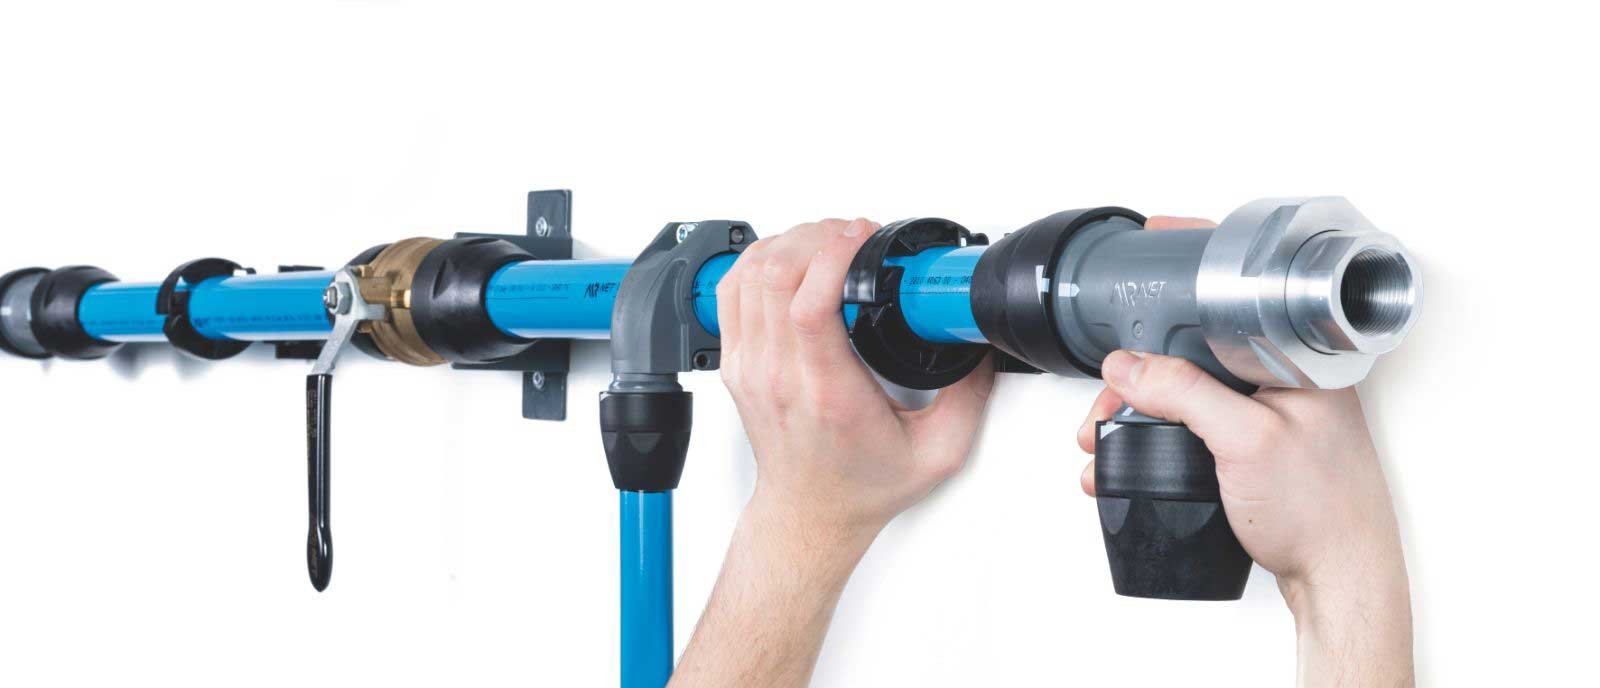 airnet installation instructions, compressed air system installation airnet videos